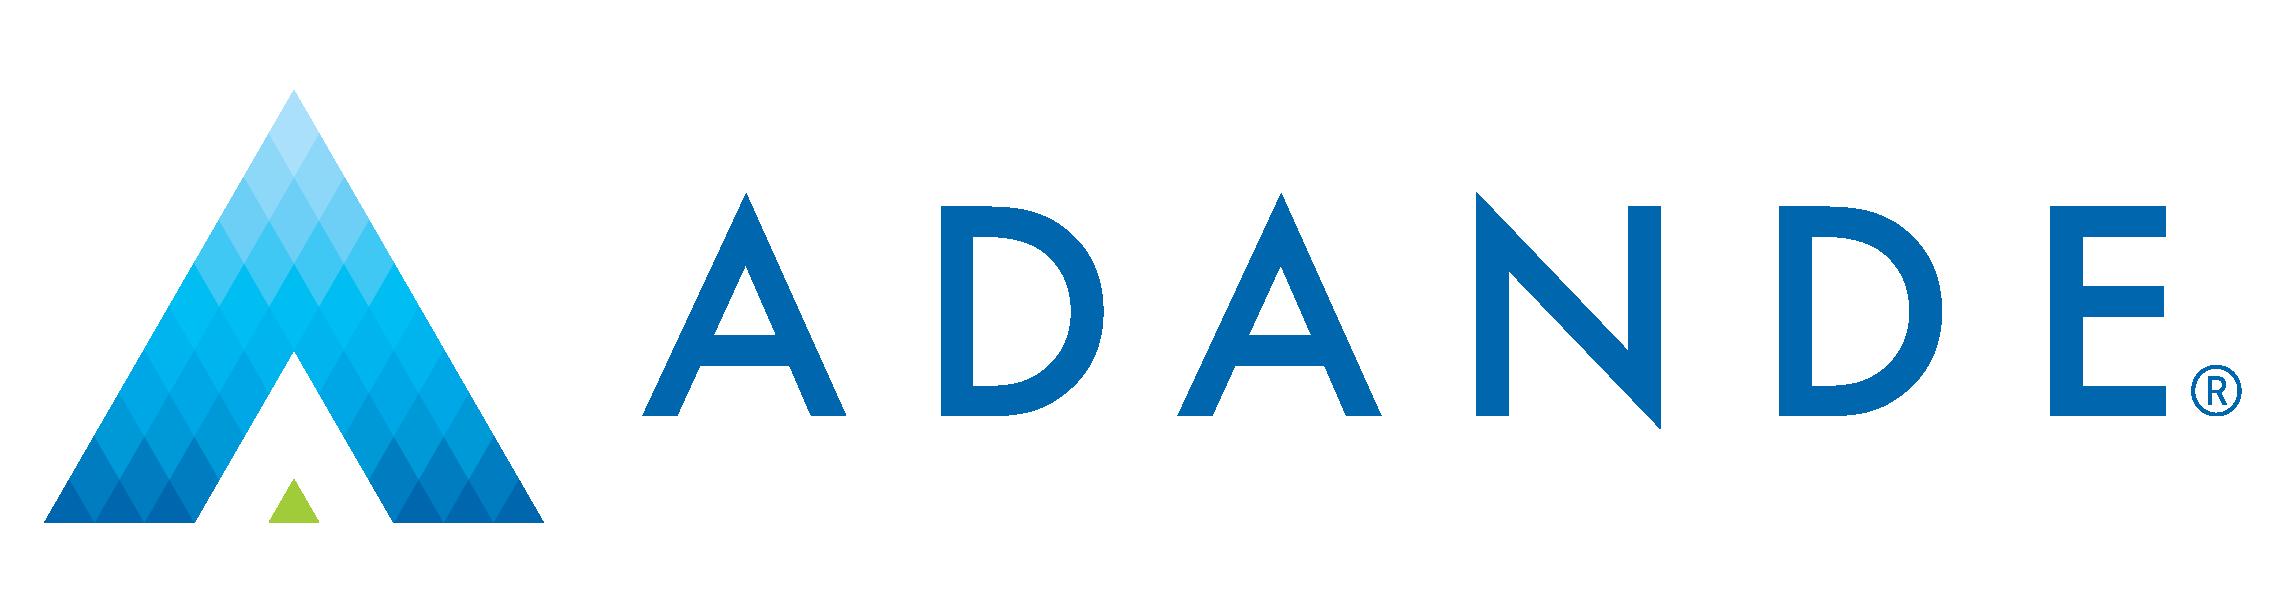 Adande horizontal logo